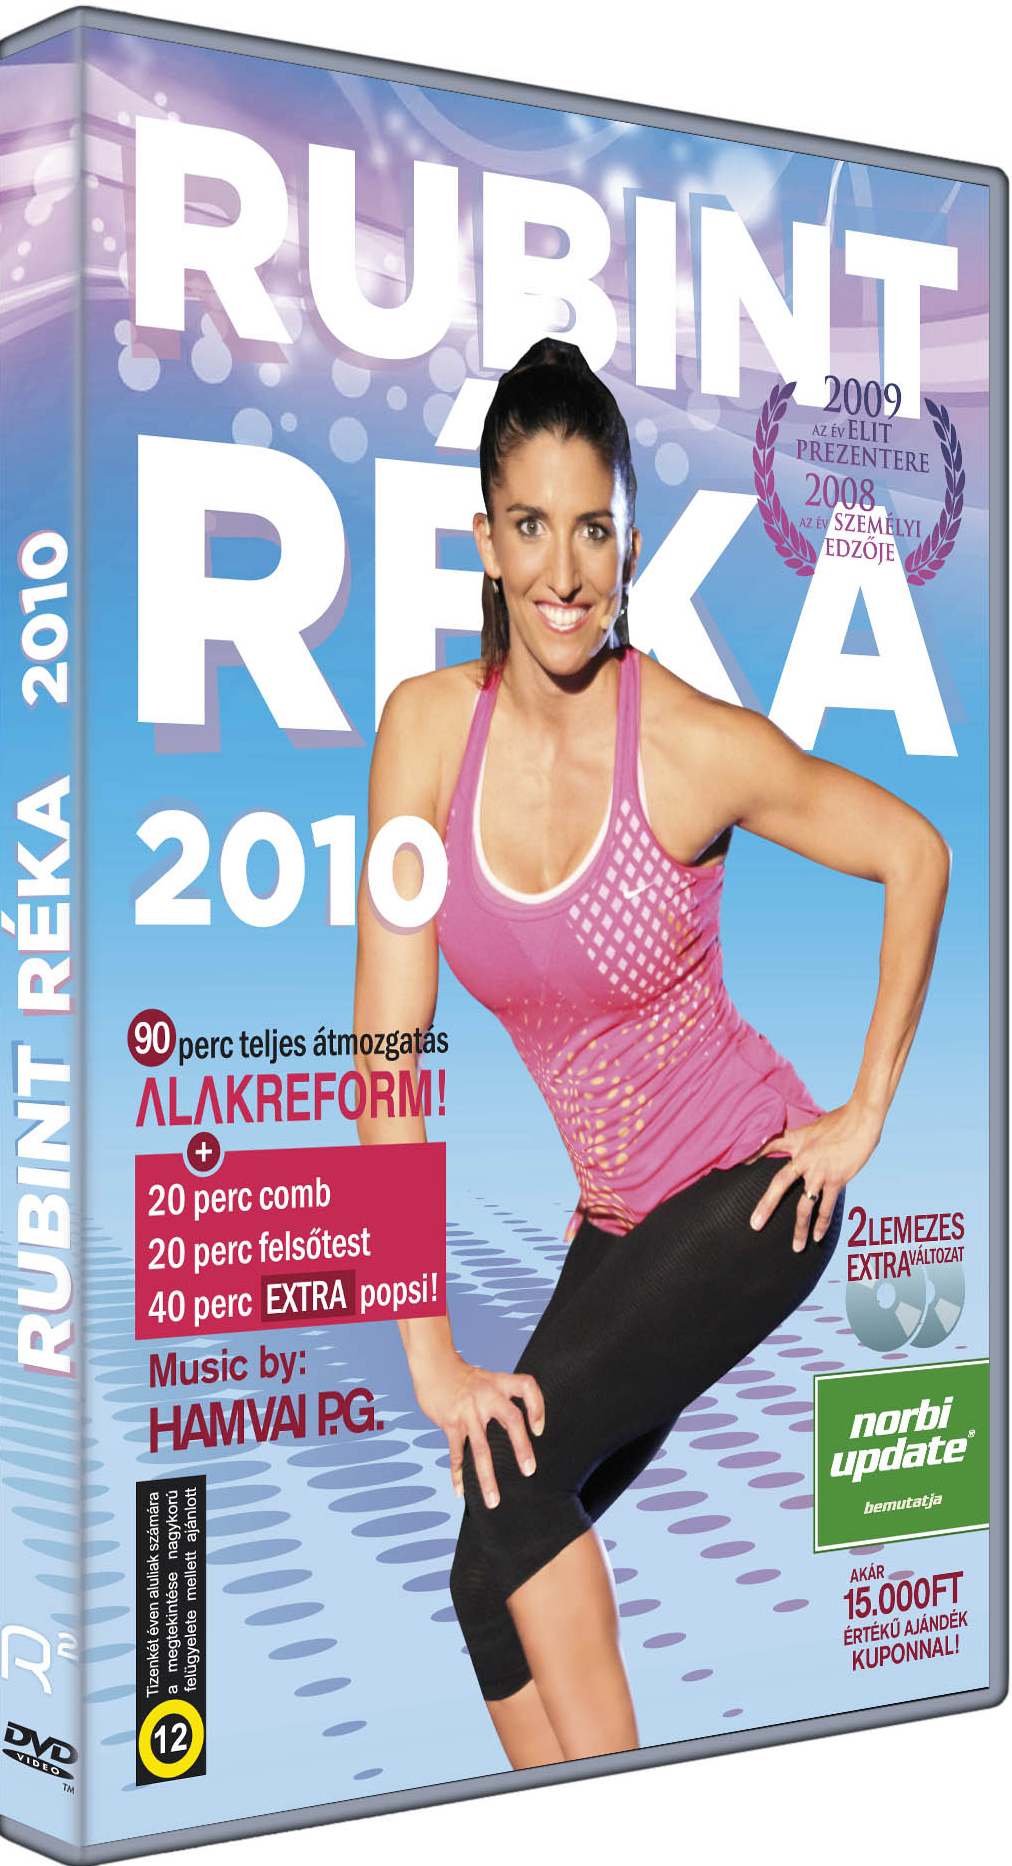 20f6c16b23 dvdabc.hu - DVD WEBSHOP, BLU-RAY WEBSHOP - DVD : RUBINT RÉKA 2010 ...